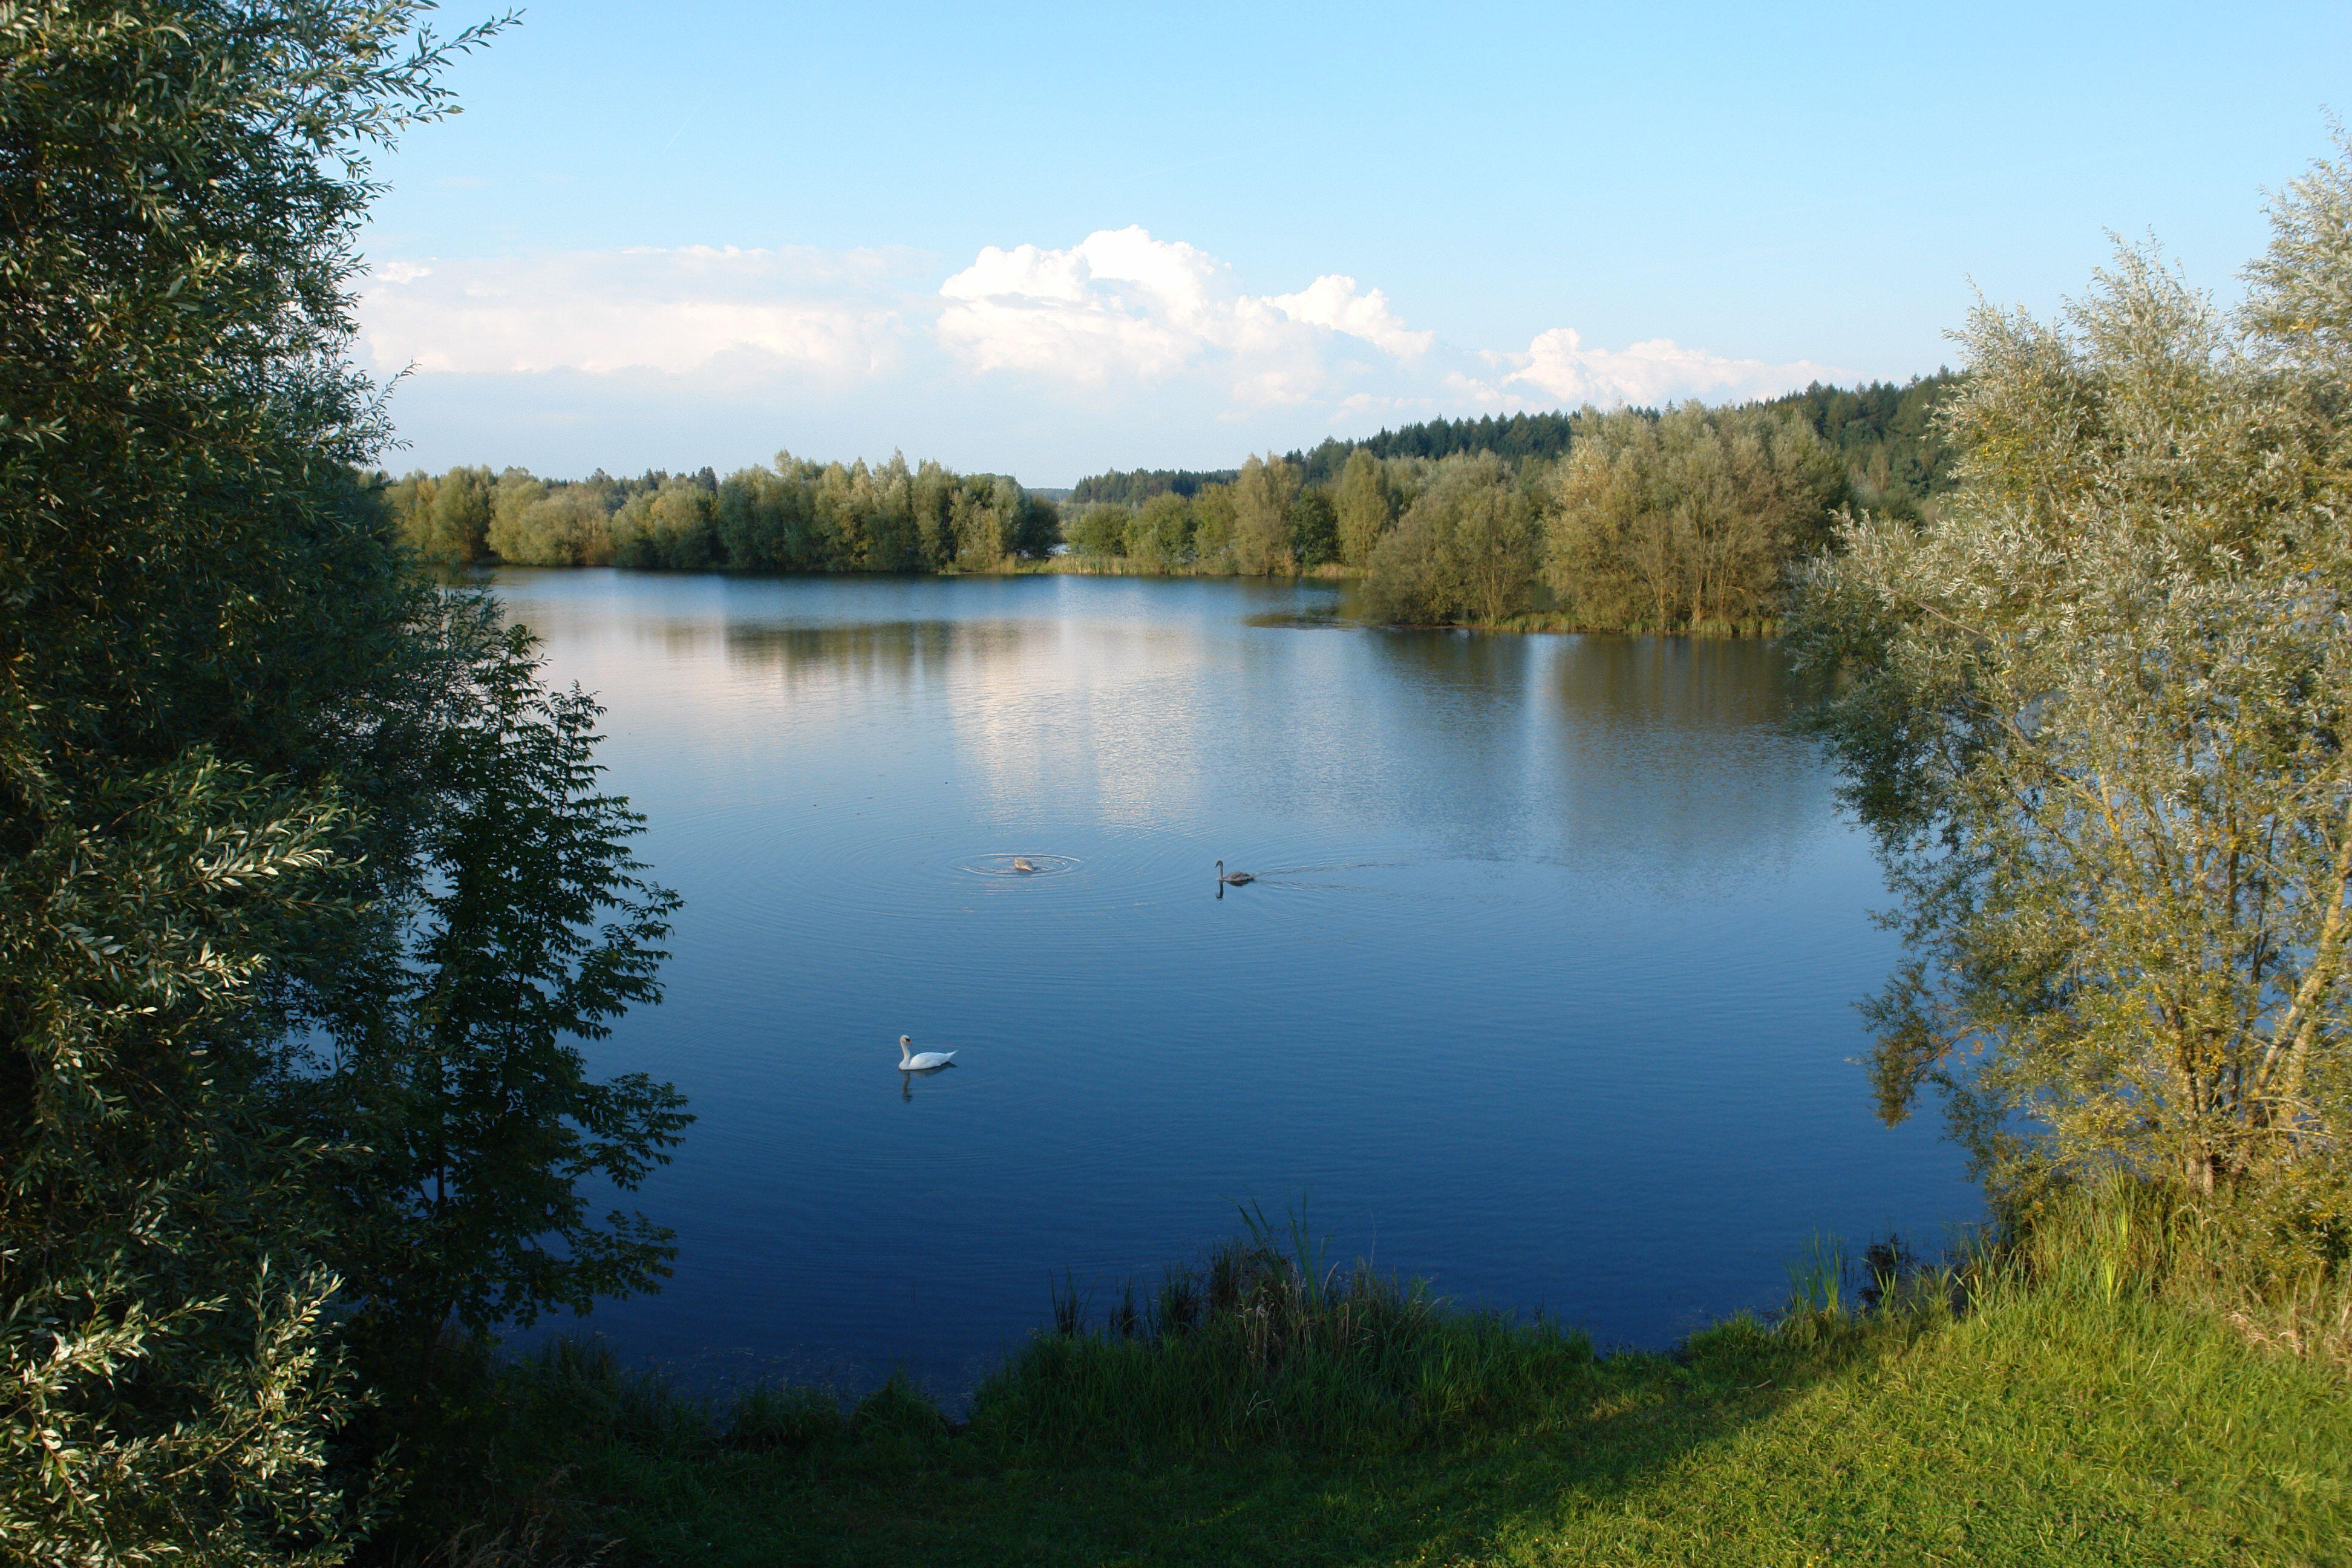 Schwackenreuter Seen - See 9